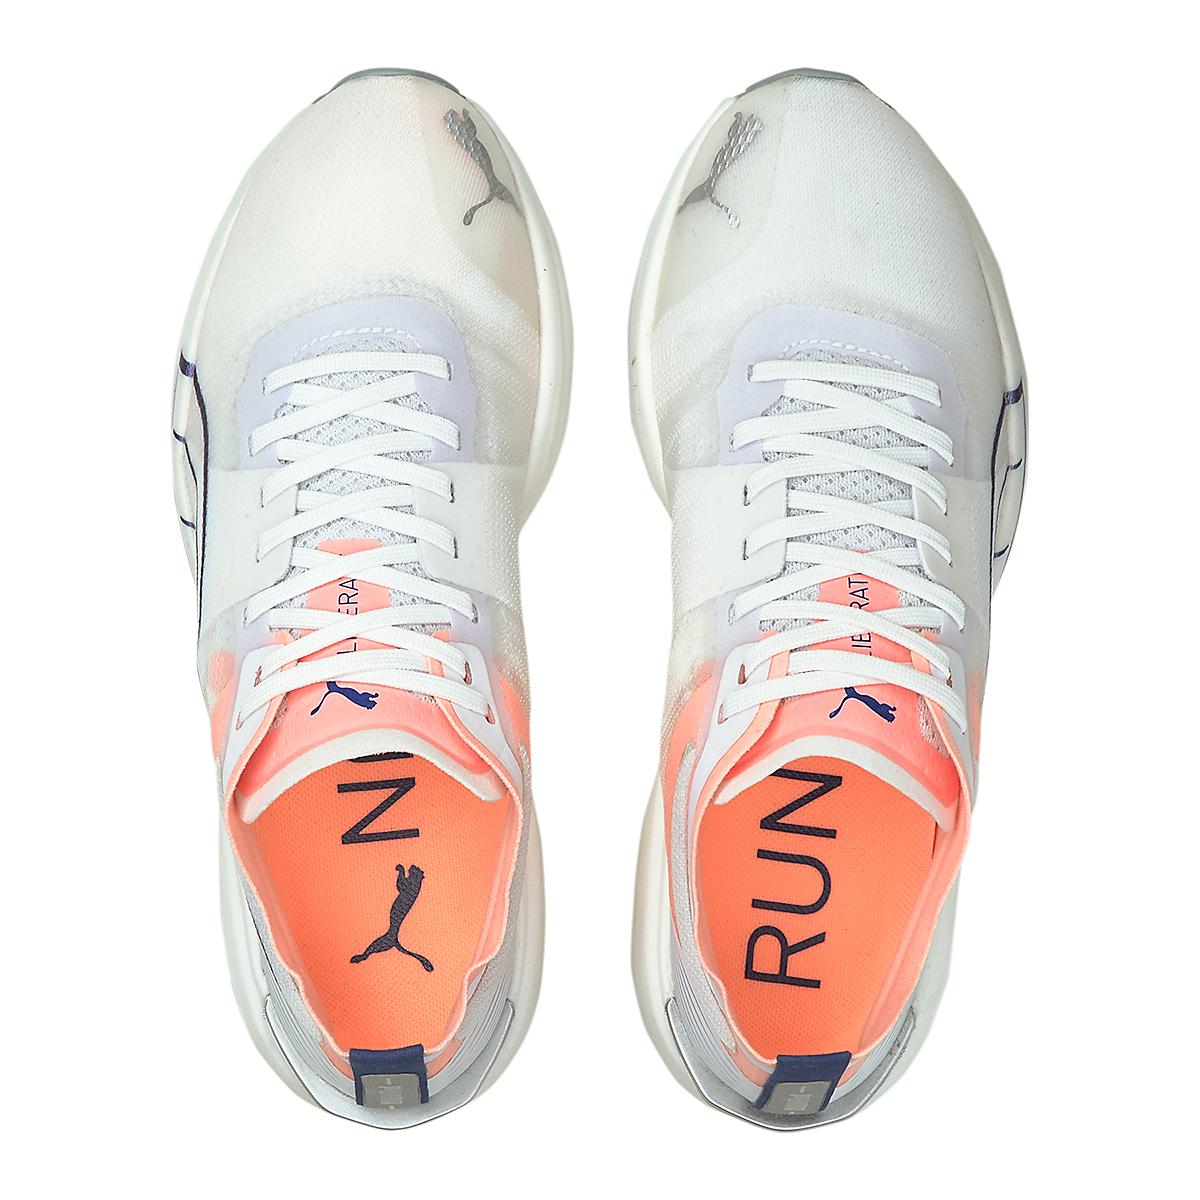 Women's Puma Liberate Nitro Running Shoe - Color: Puma White-Elektro Peach - Size: 6.5 - Width: Regular, Puma White-Elektro Peach, large, image 4